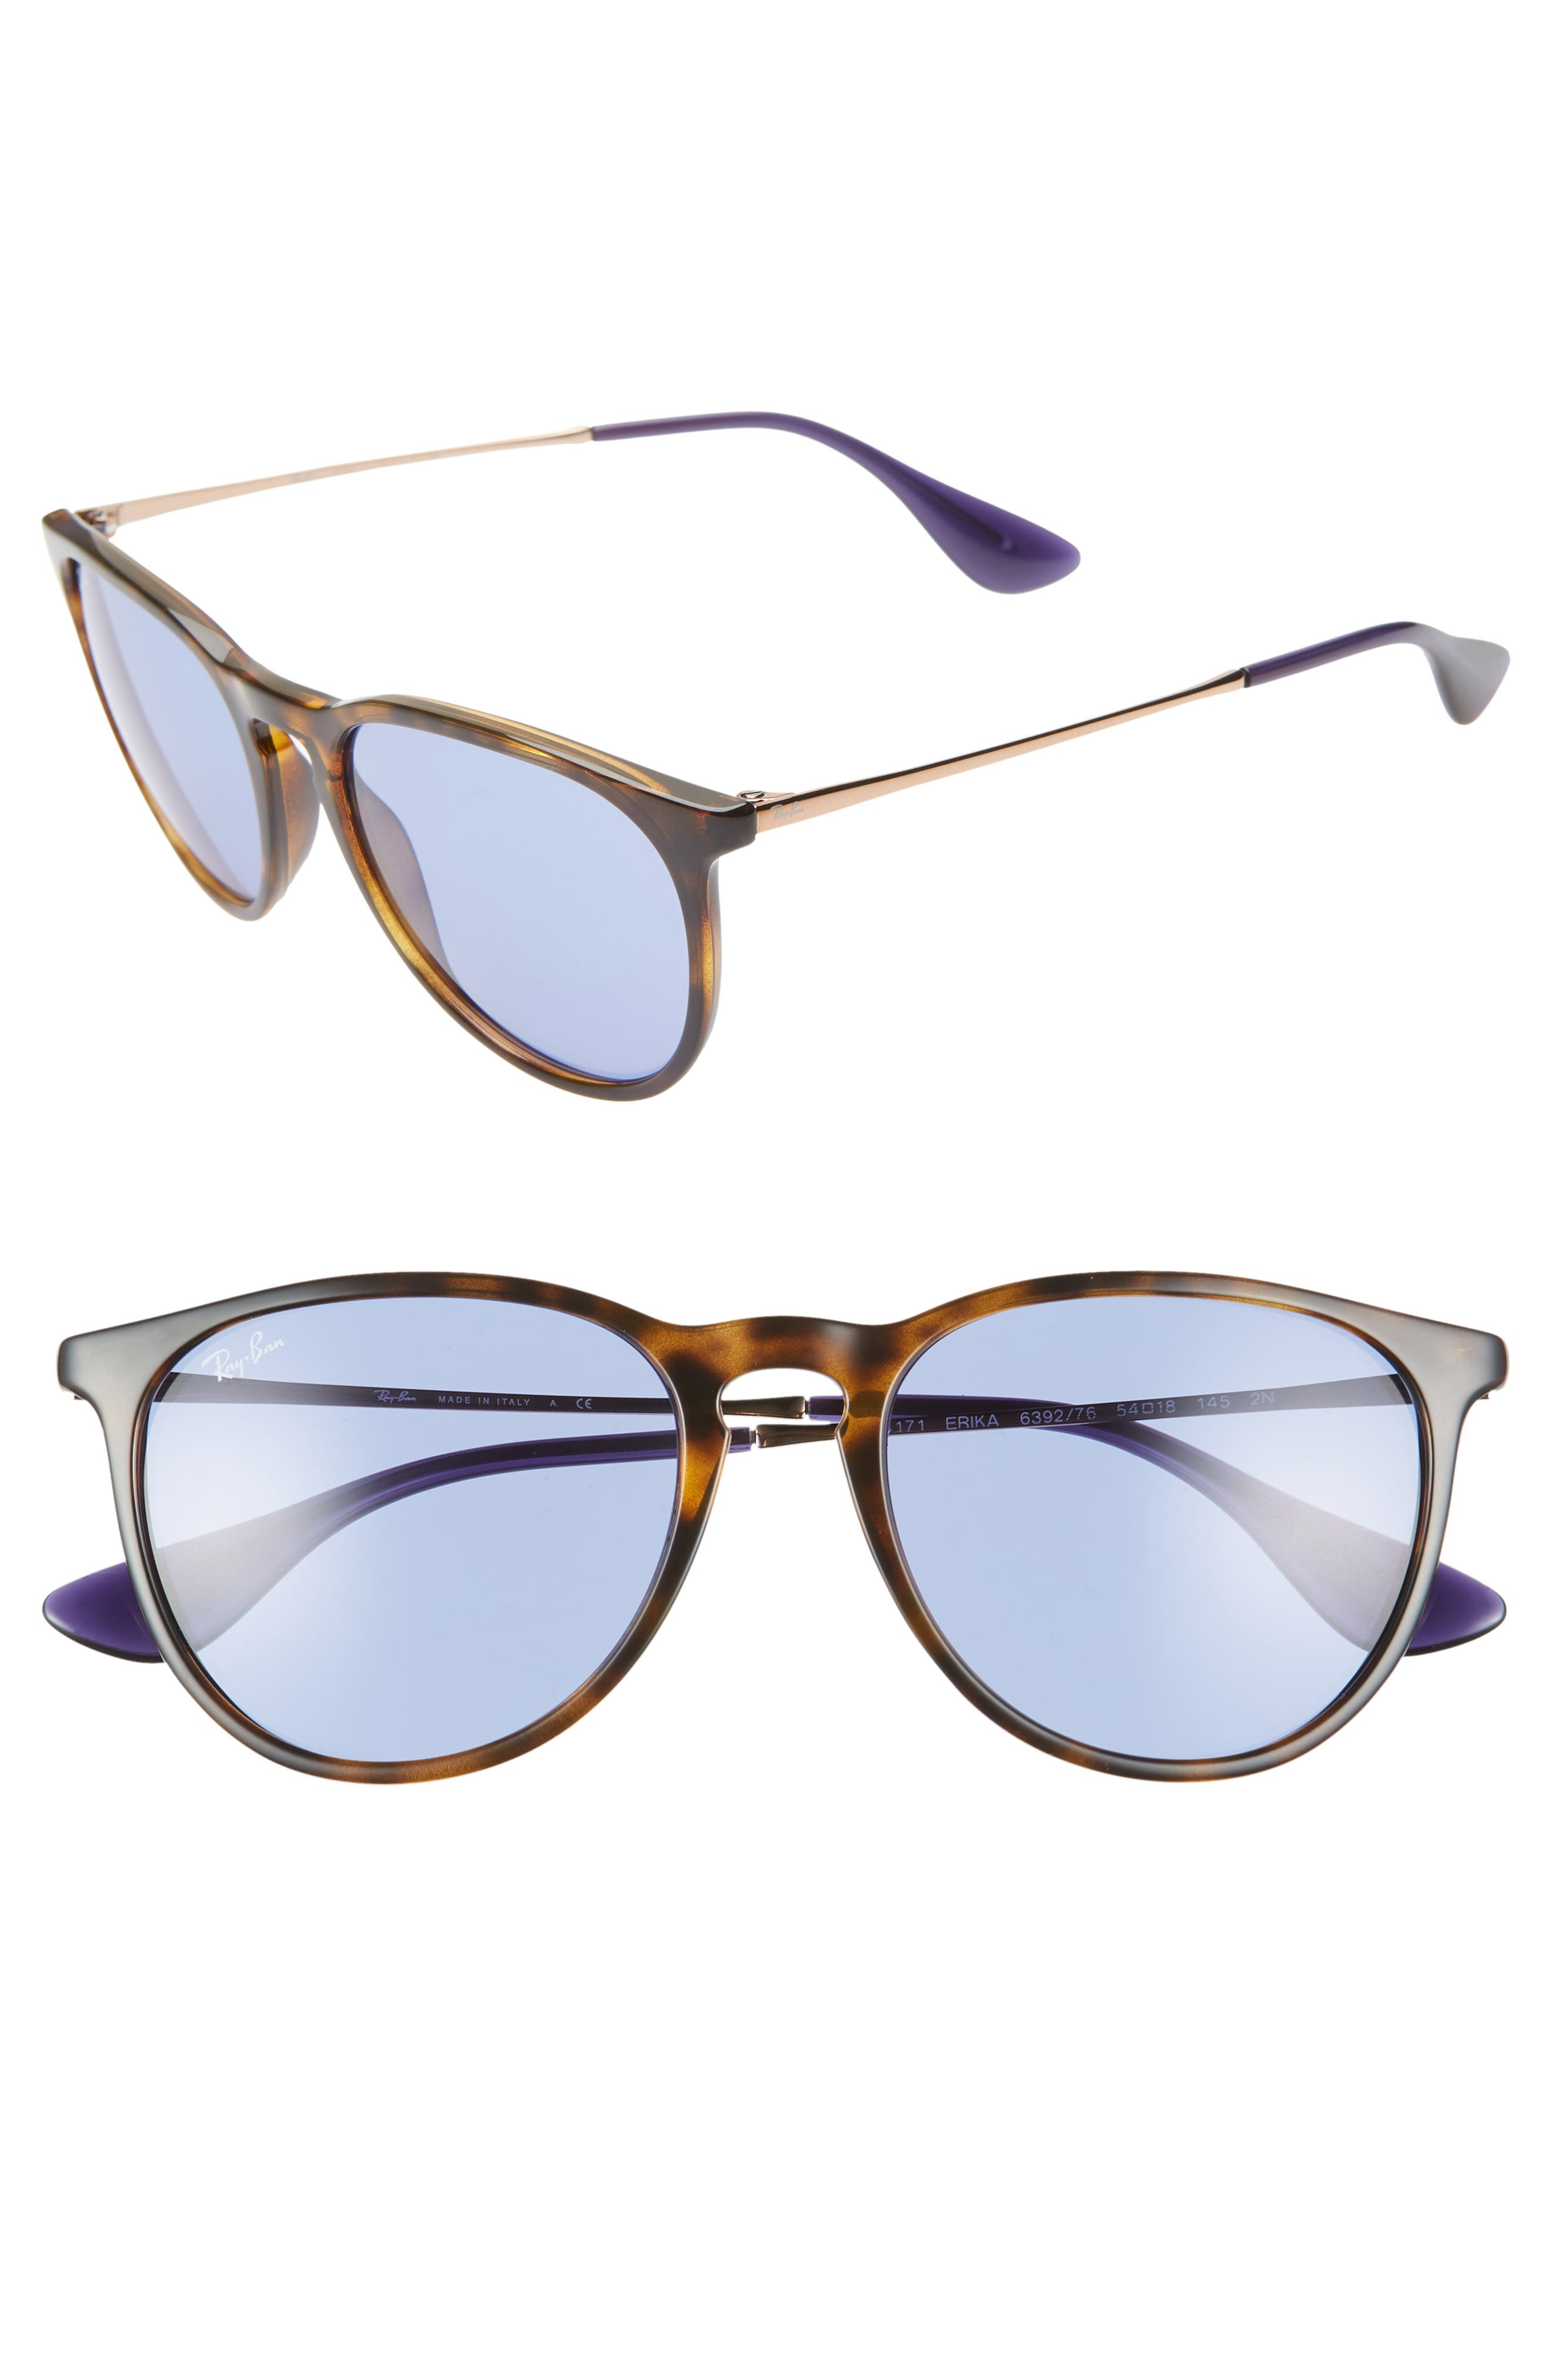 Ray-Ban Erika Classic 5m Sunglasses - Tortoise/ Blue Solid